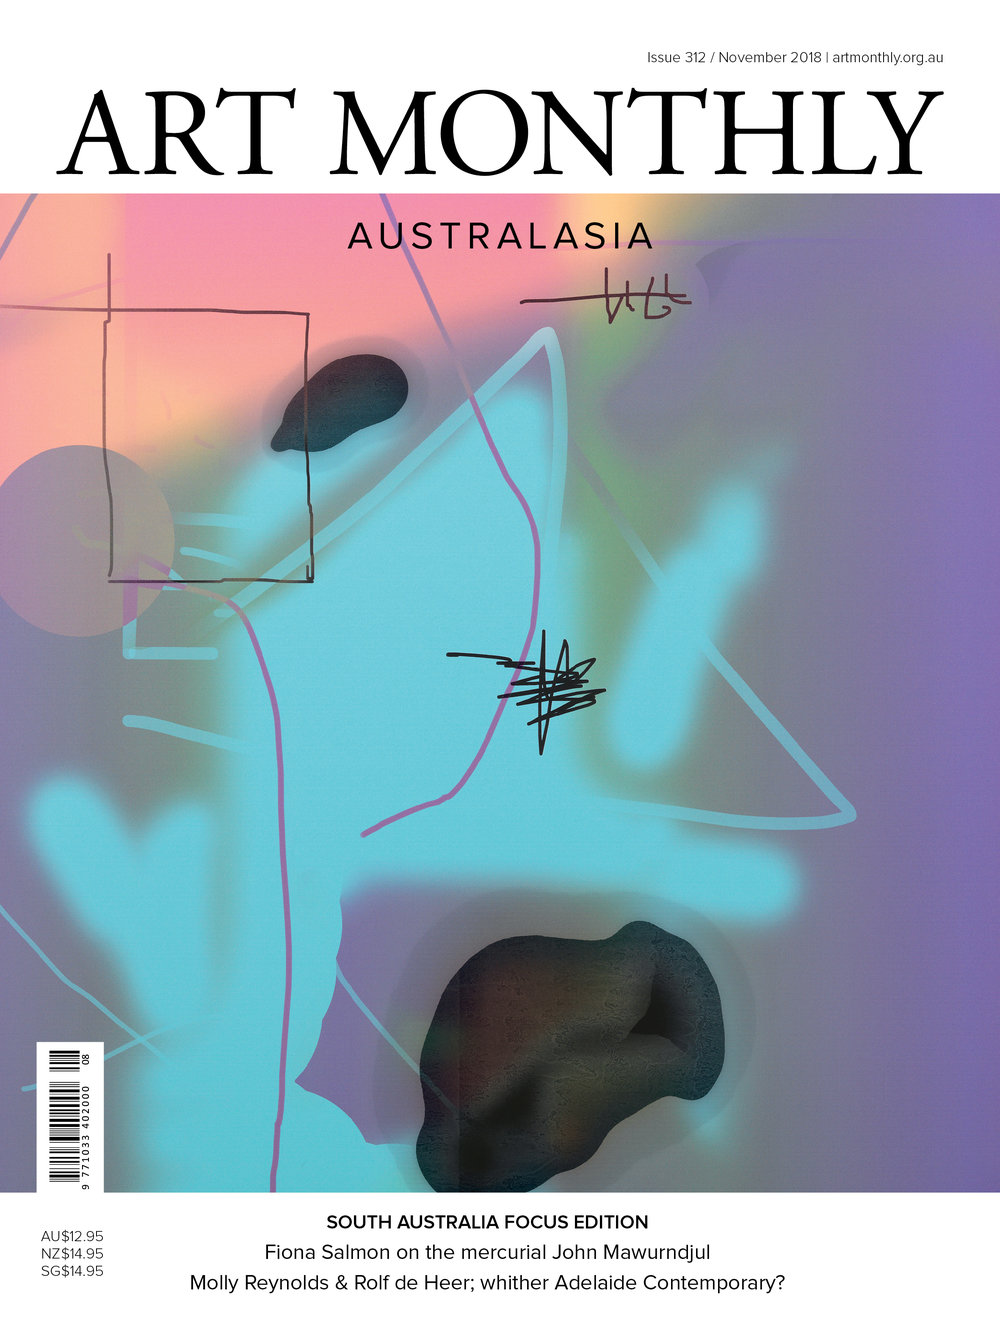 Issue 312 November 2018